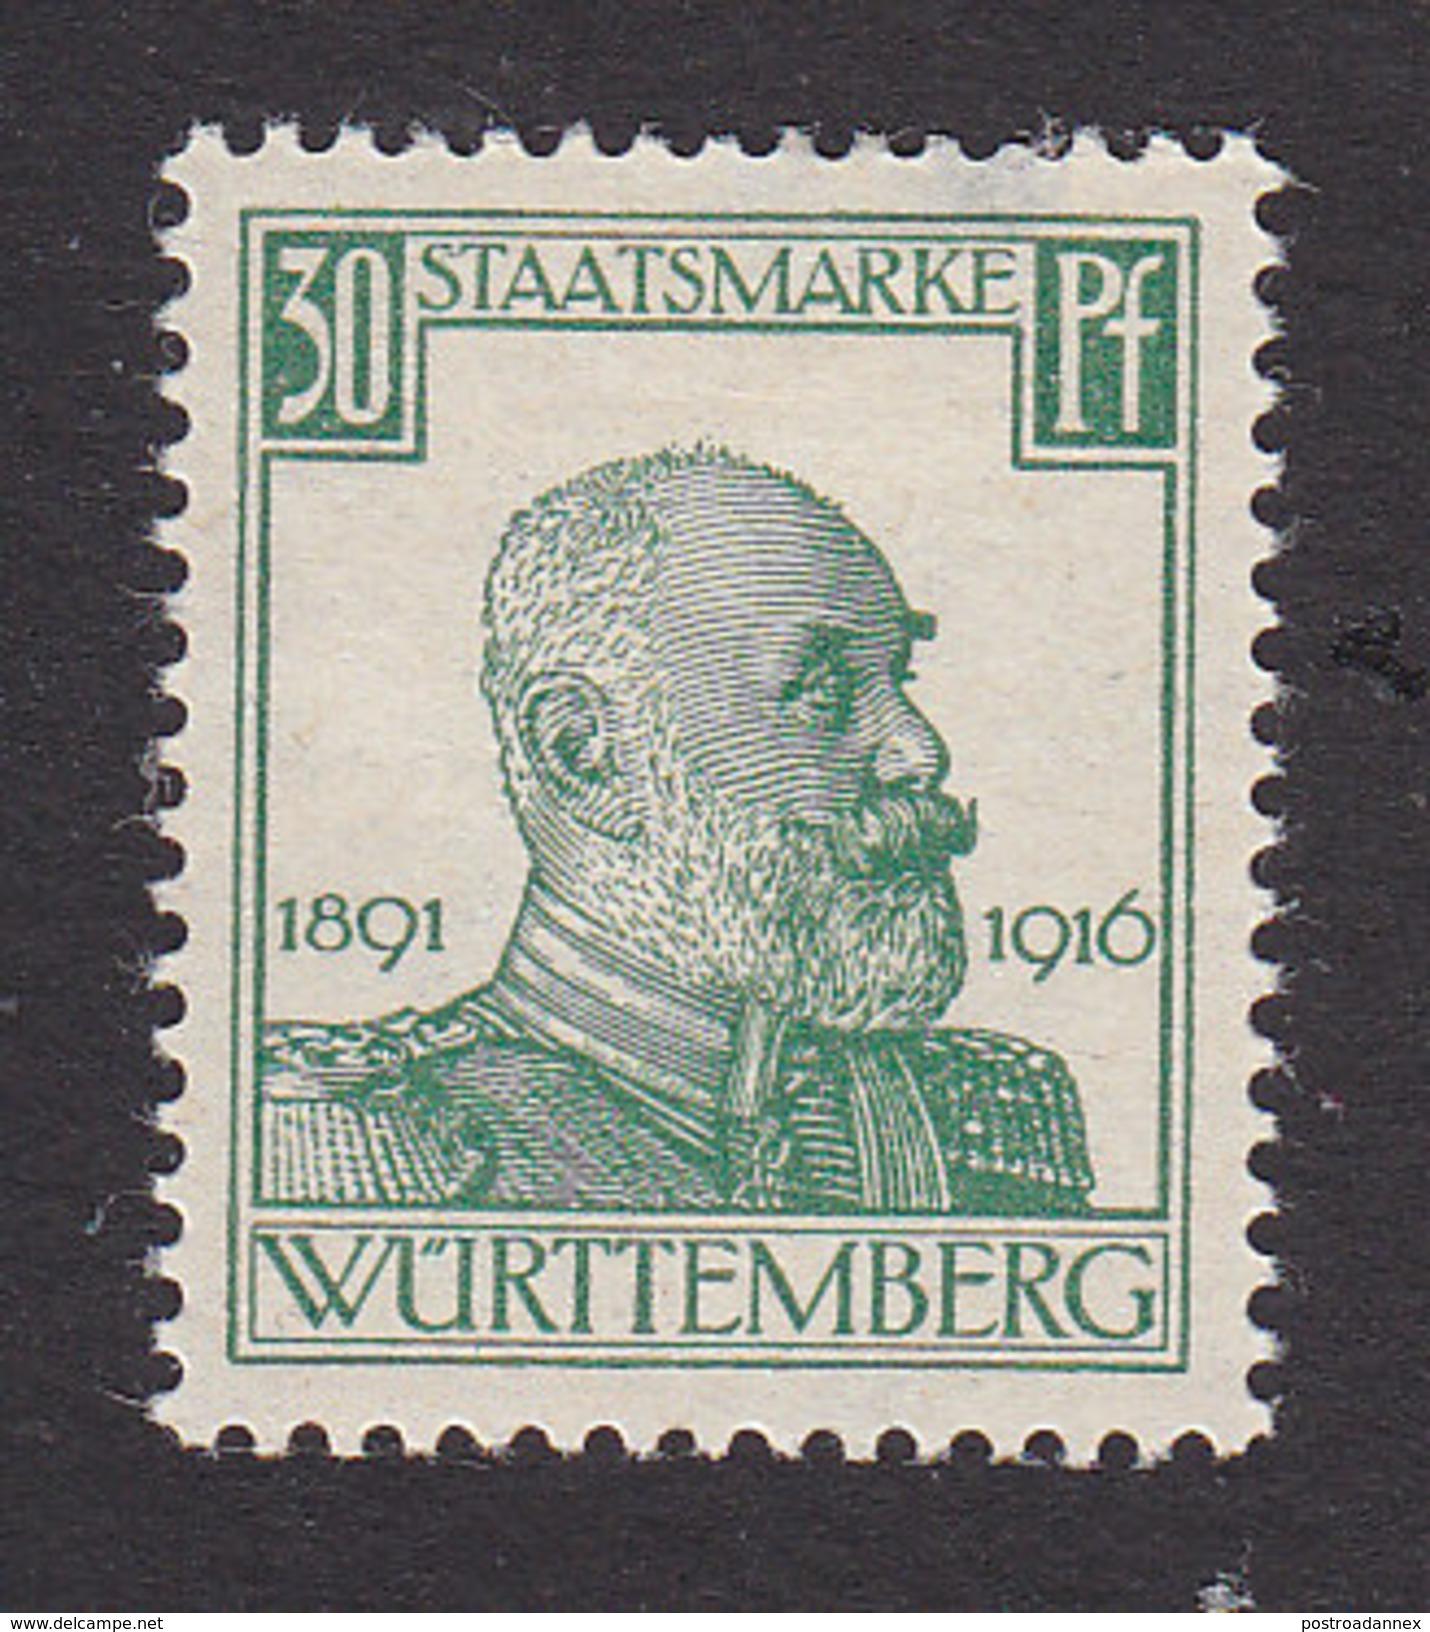 Wurttemberg, Scott #O142, Mint Hinged, King Wilhelm I, Issued 1916 - Wurttemberg